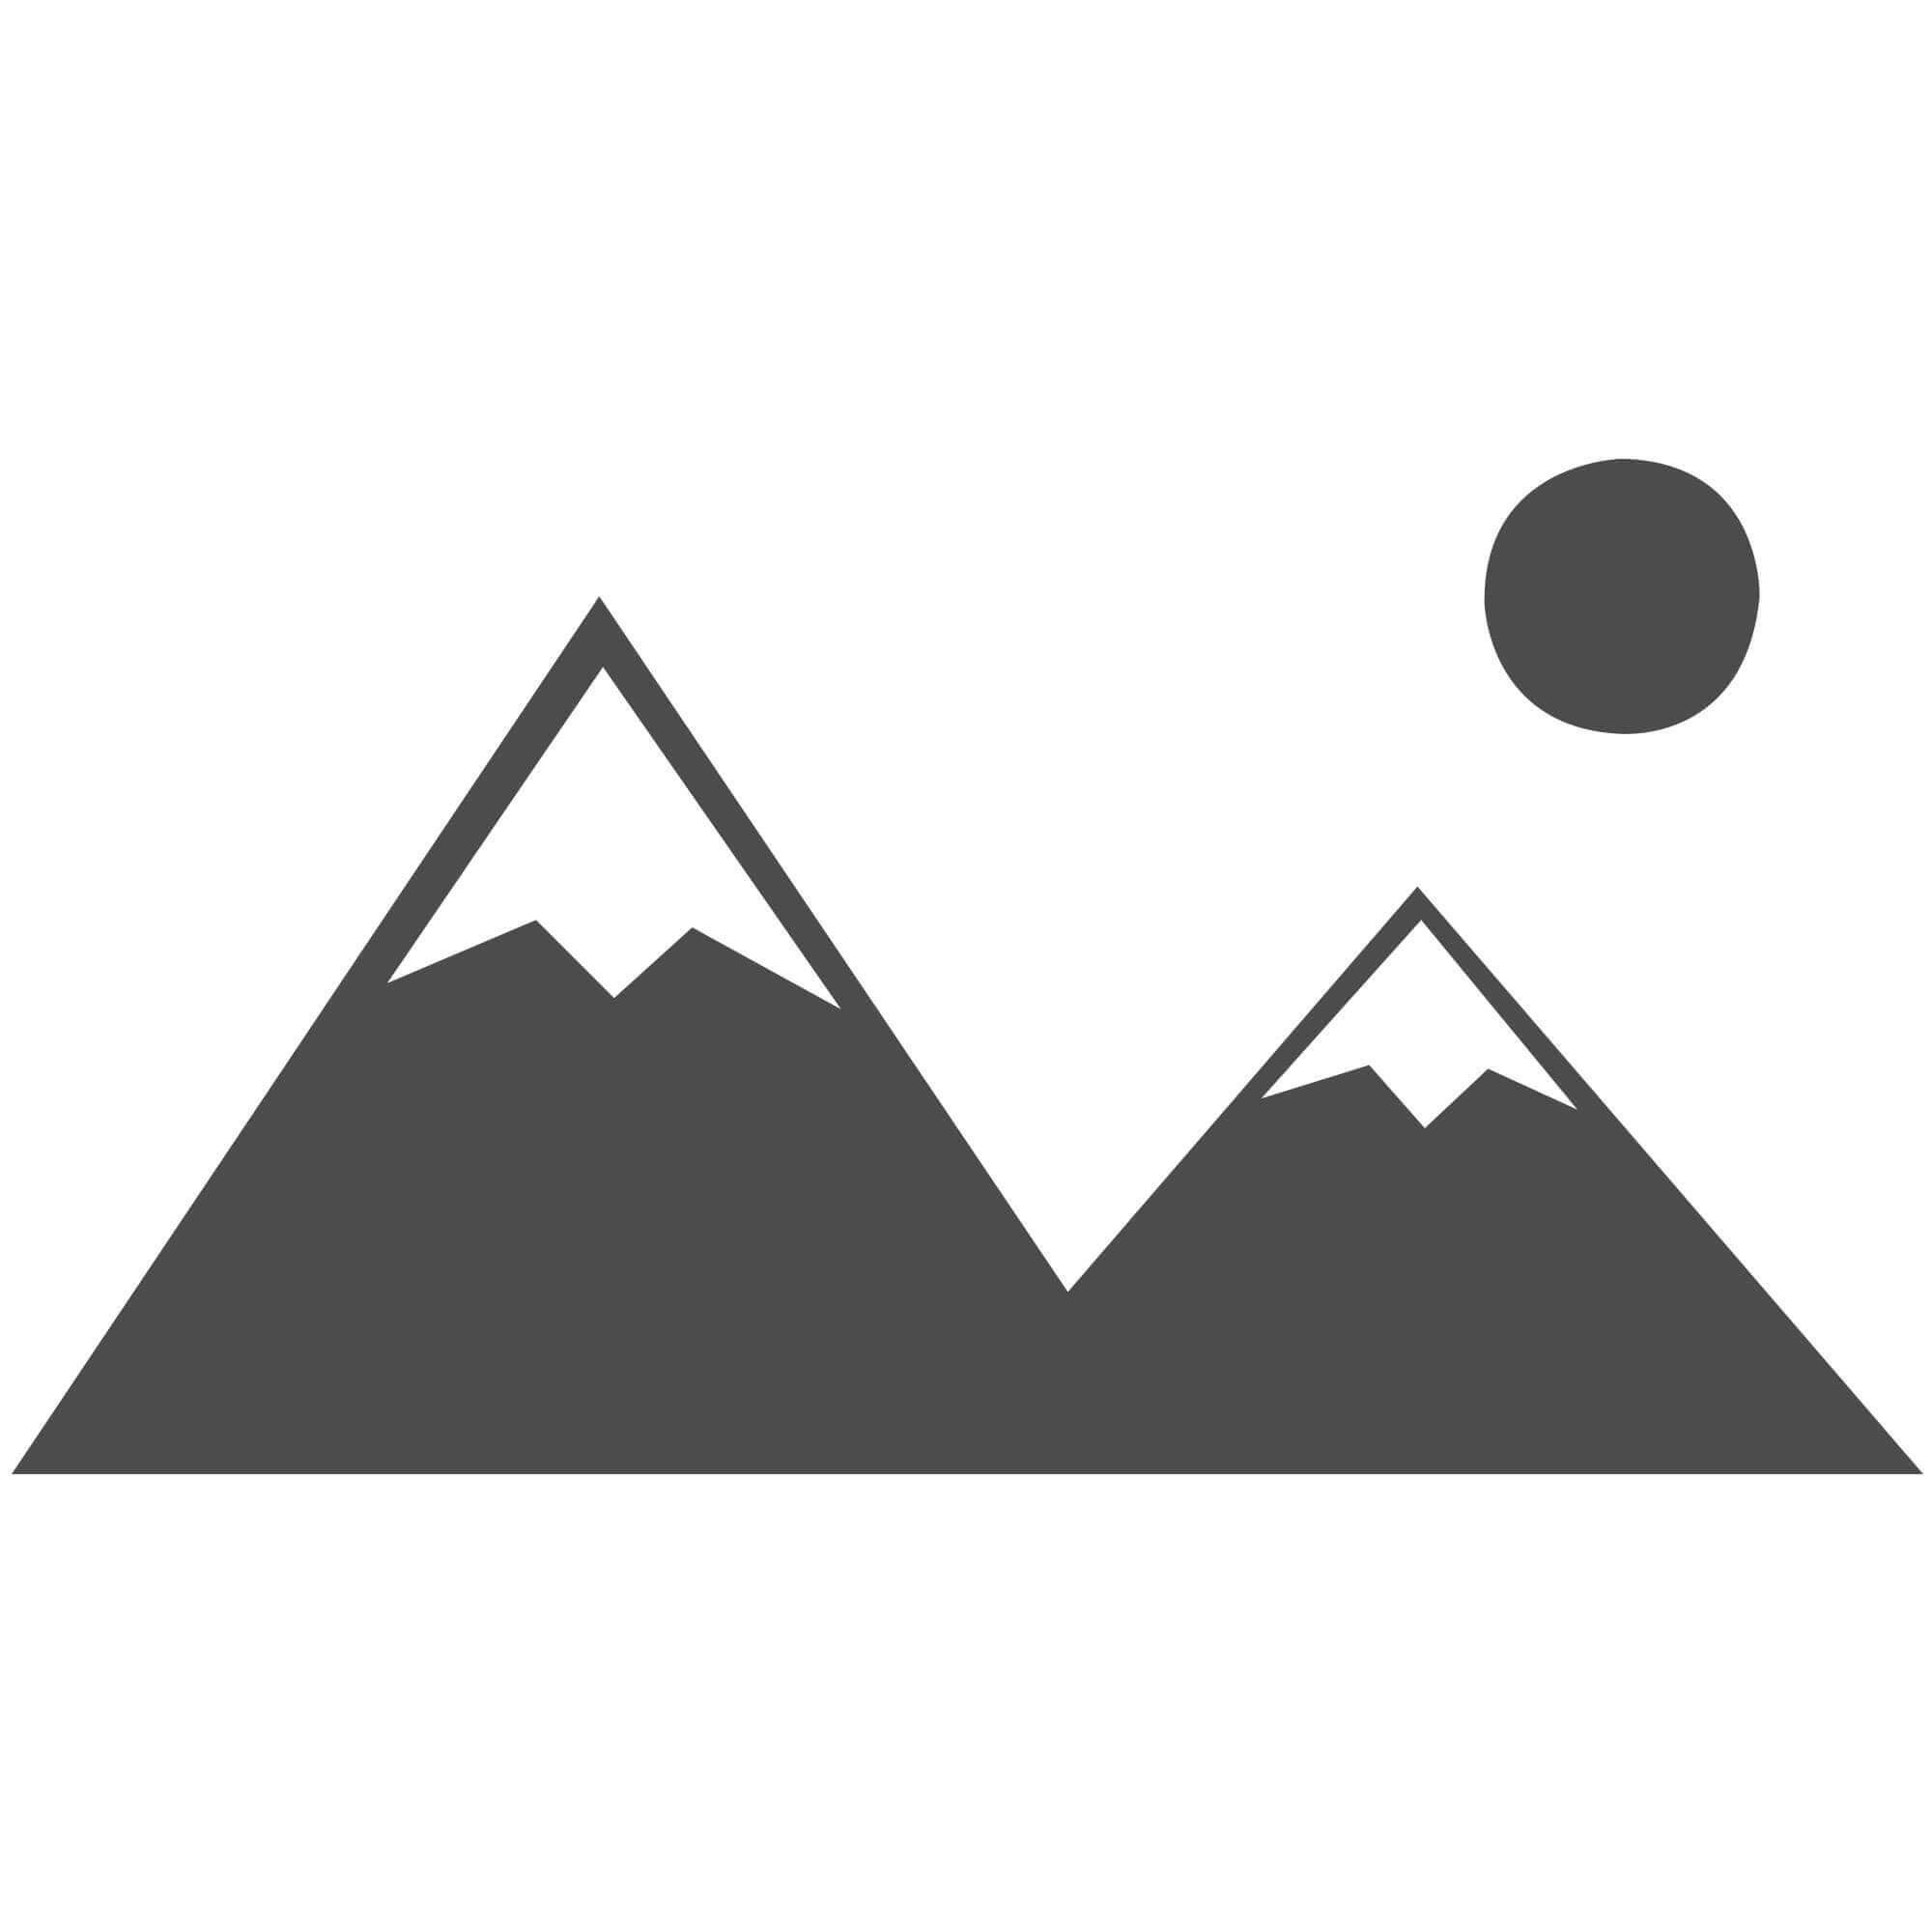 "Splendour Shadow Shaggy Rug - Silver - Size 160 x 220 cm (5'3"" x 7'3"")"